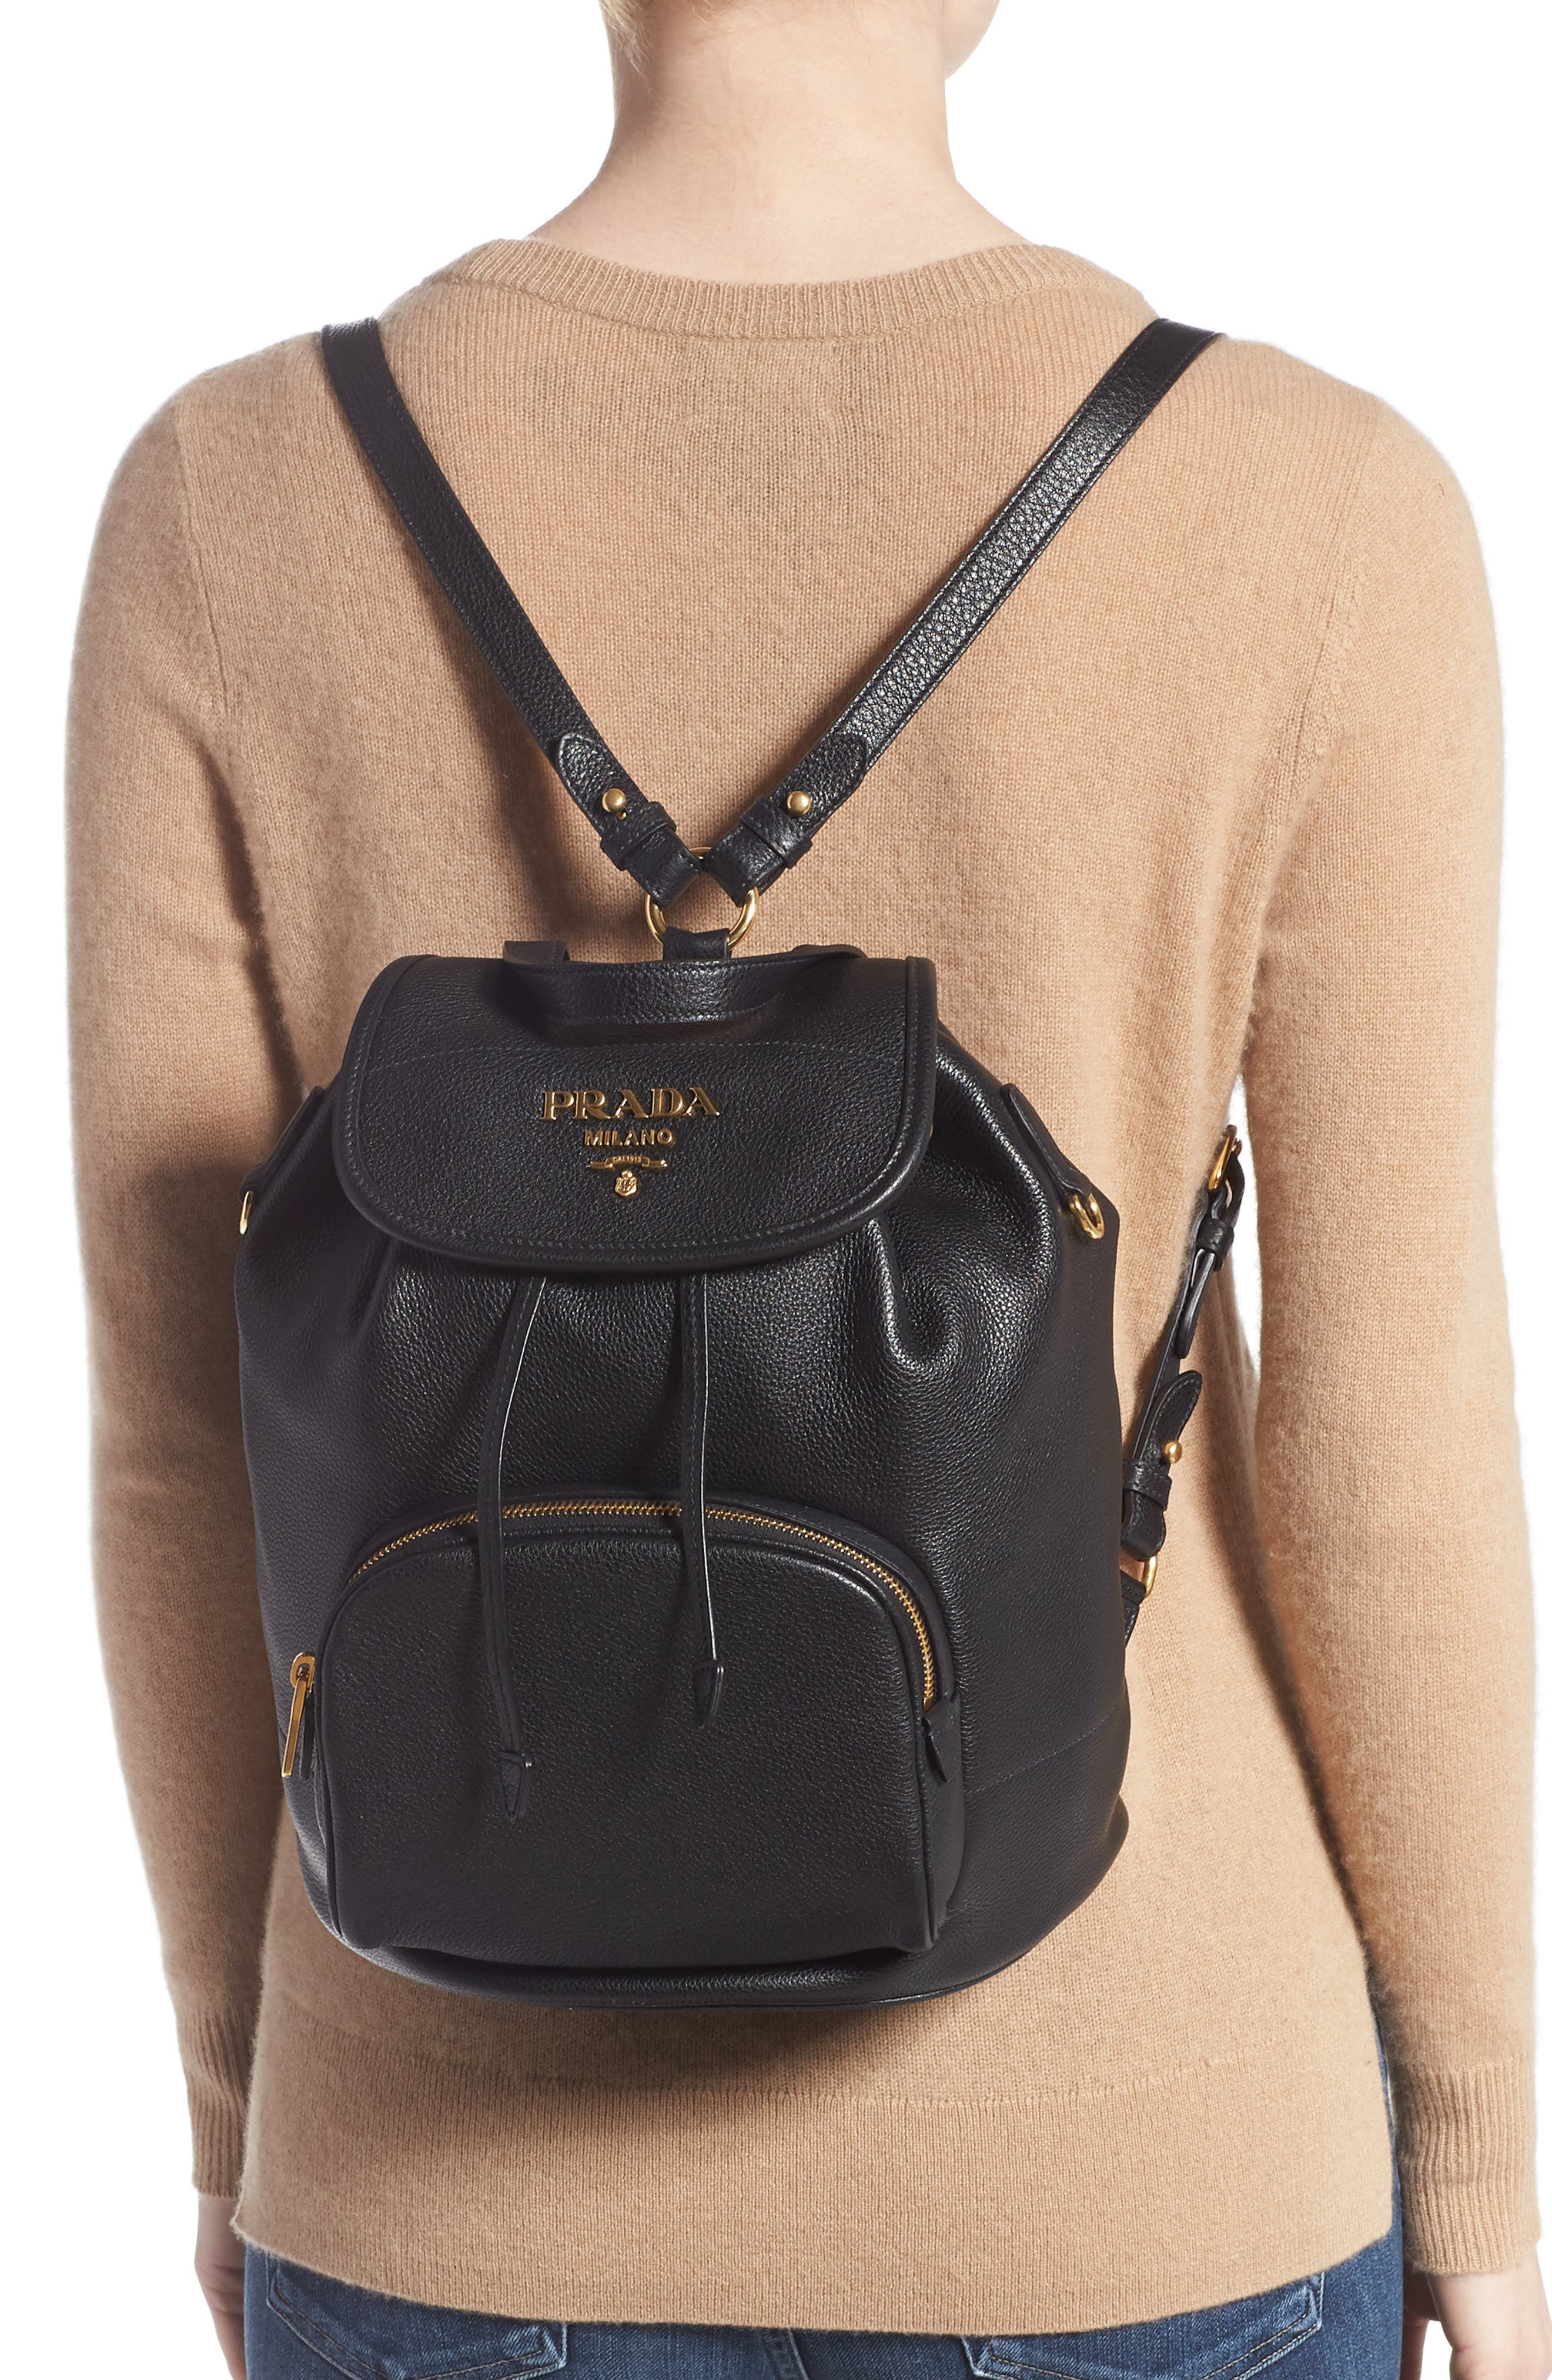 PRADA, Vitello Daino Pebbled Leather Backpack, Alternate thumbnail 3, color, 001